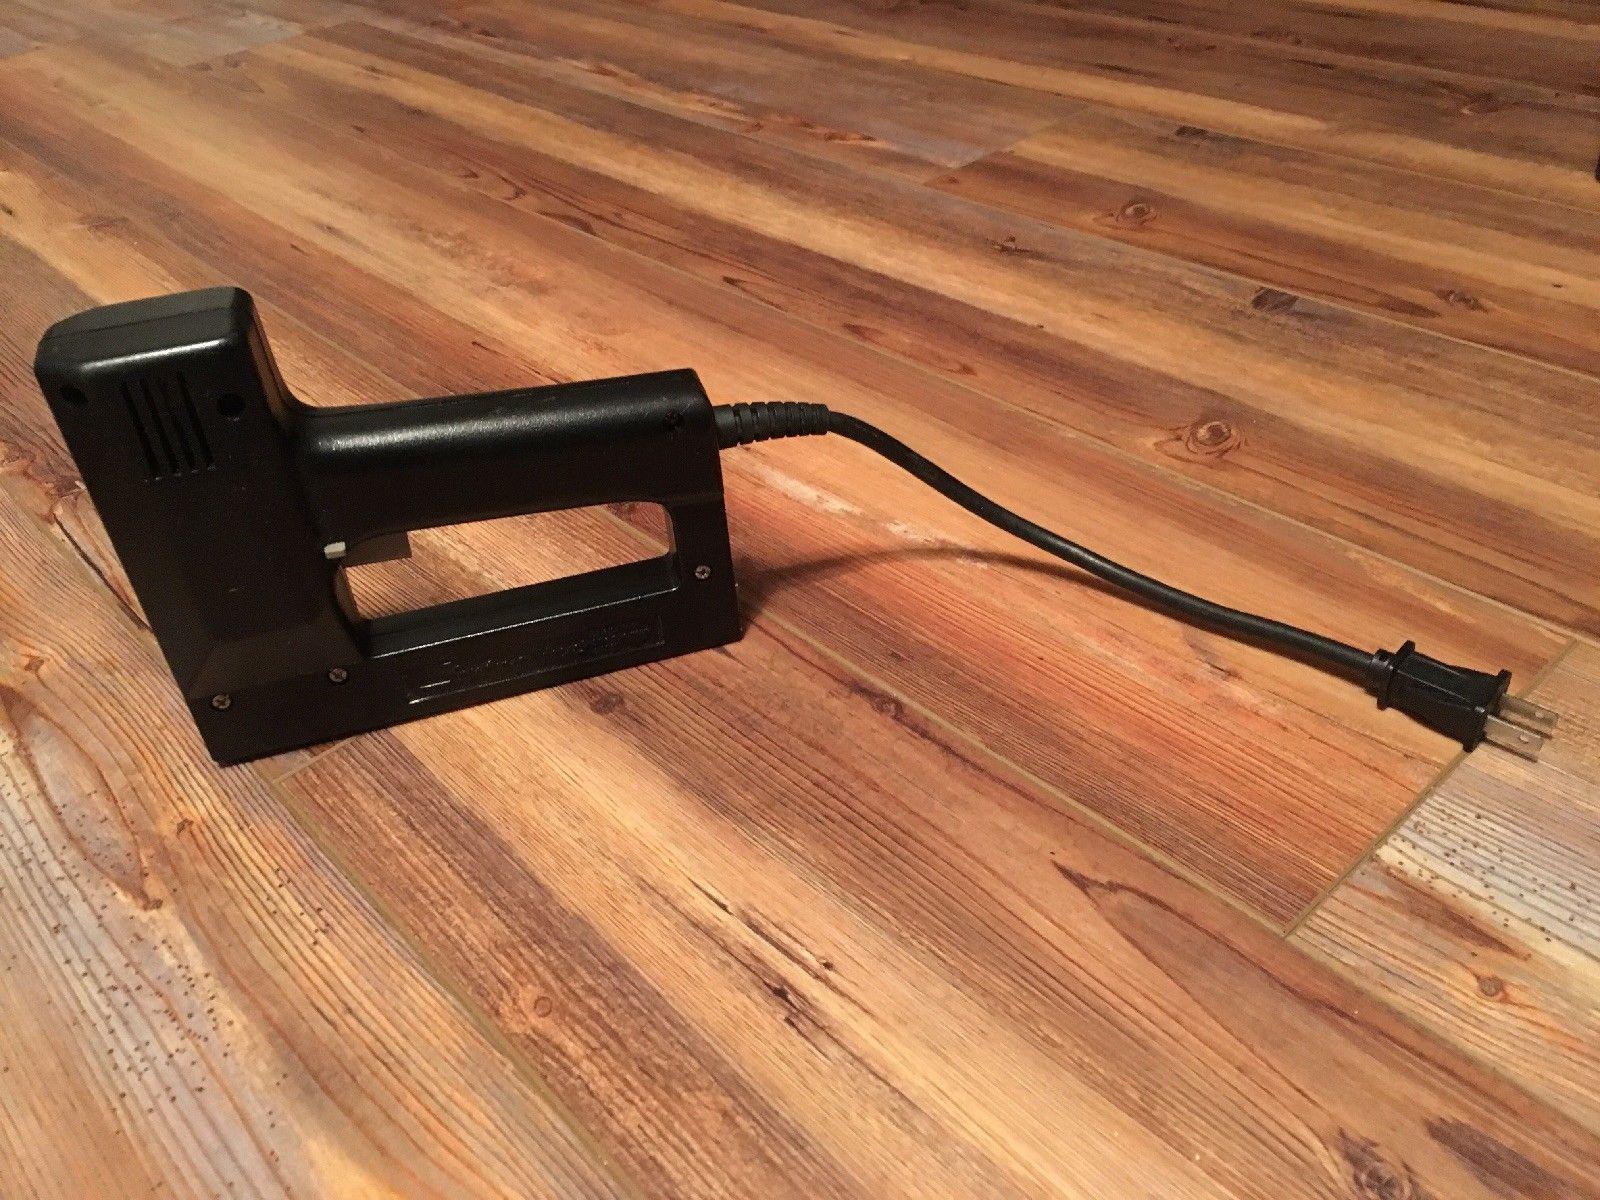 ebay hardwood floor nailer of swingline electric staplegun 34302 flush design for tight spots ebay with s l1600